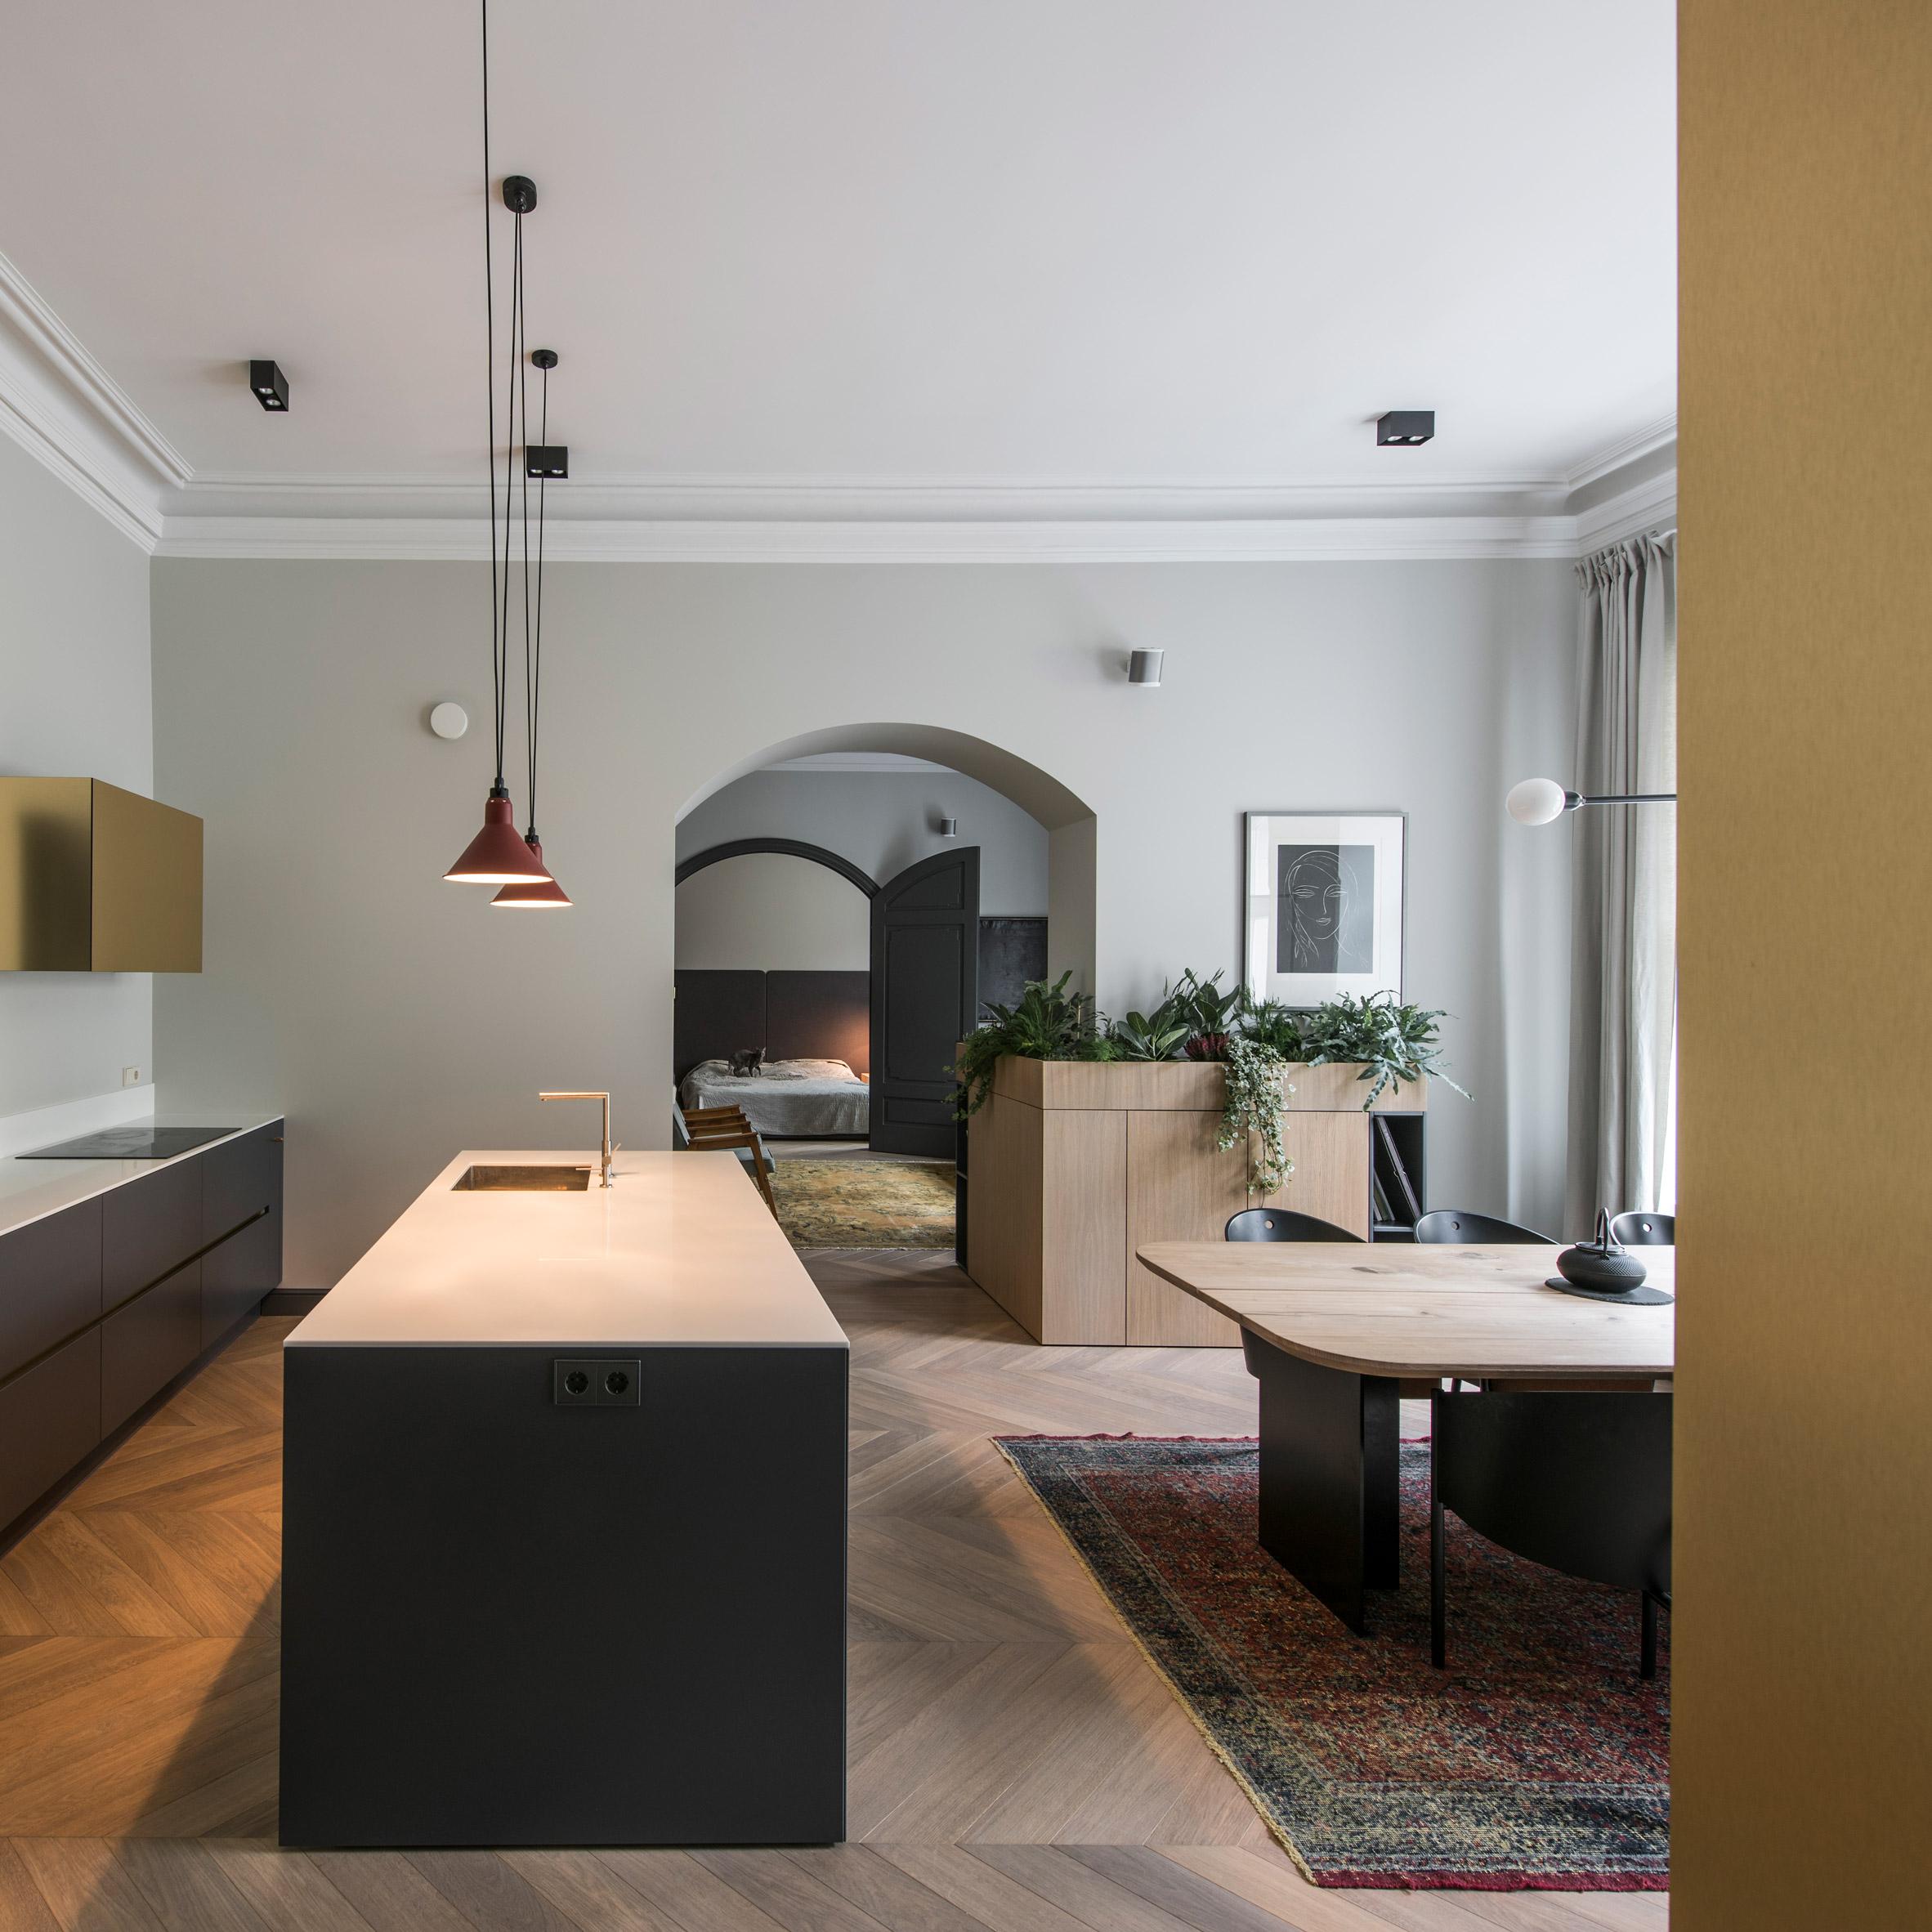 Dezeen's top 10 home interiors of 2018: Apartment Vilnius